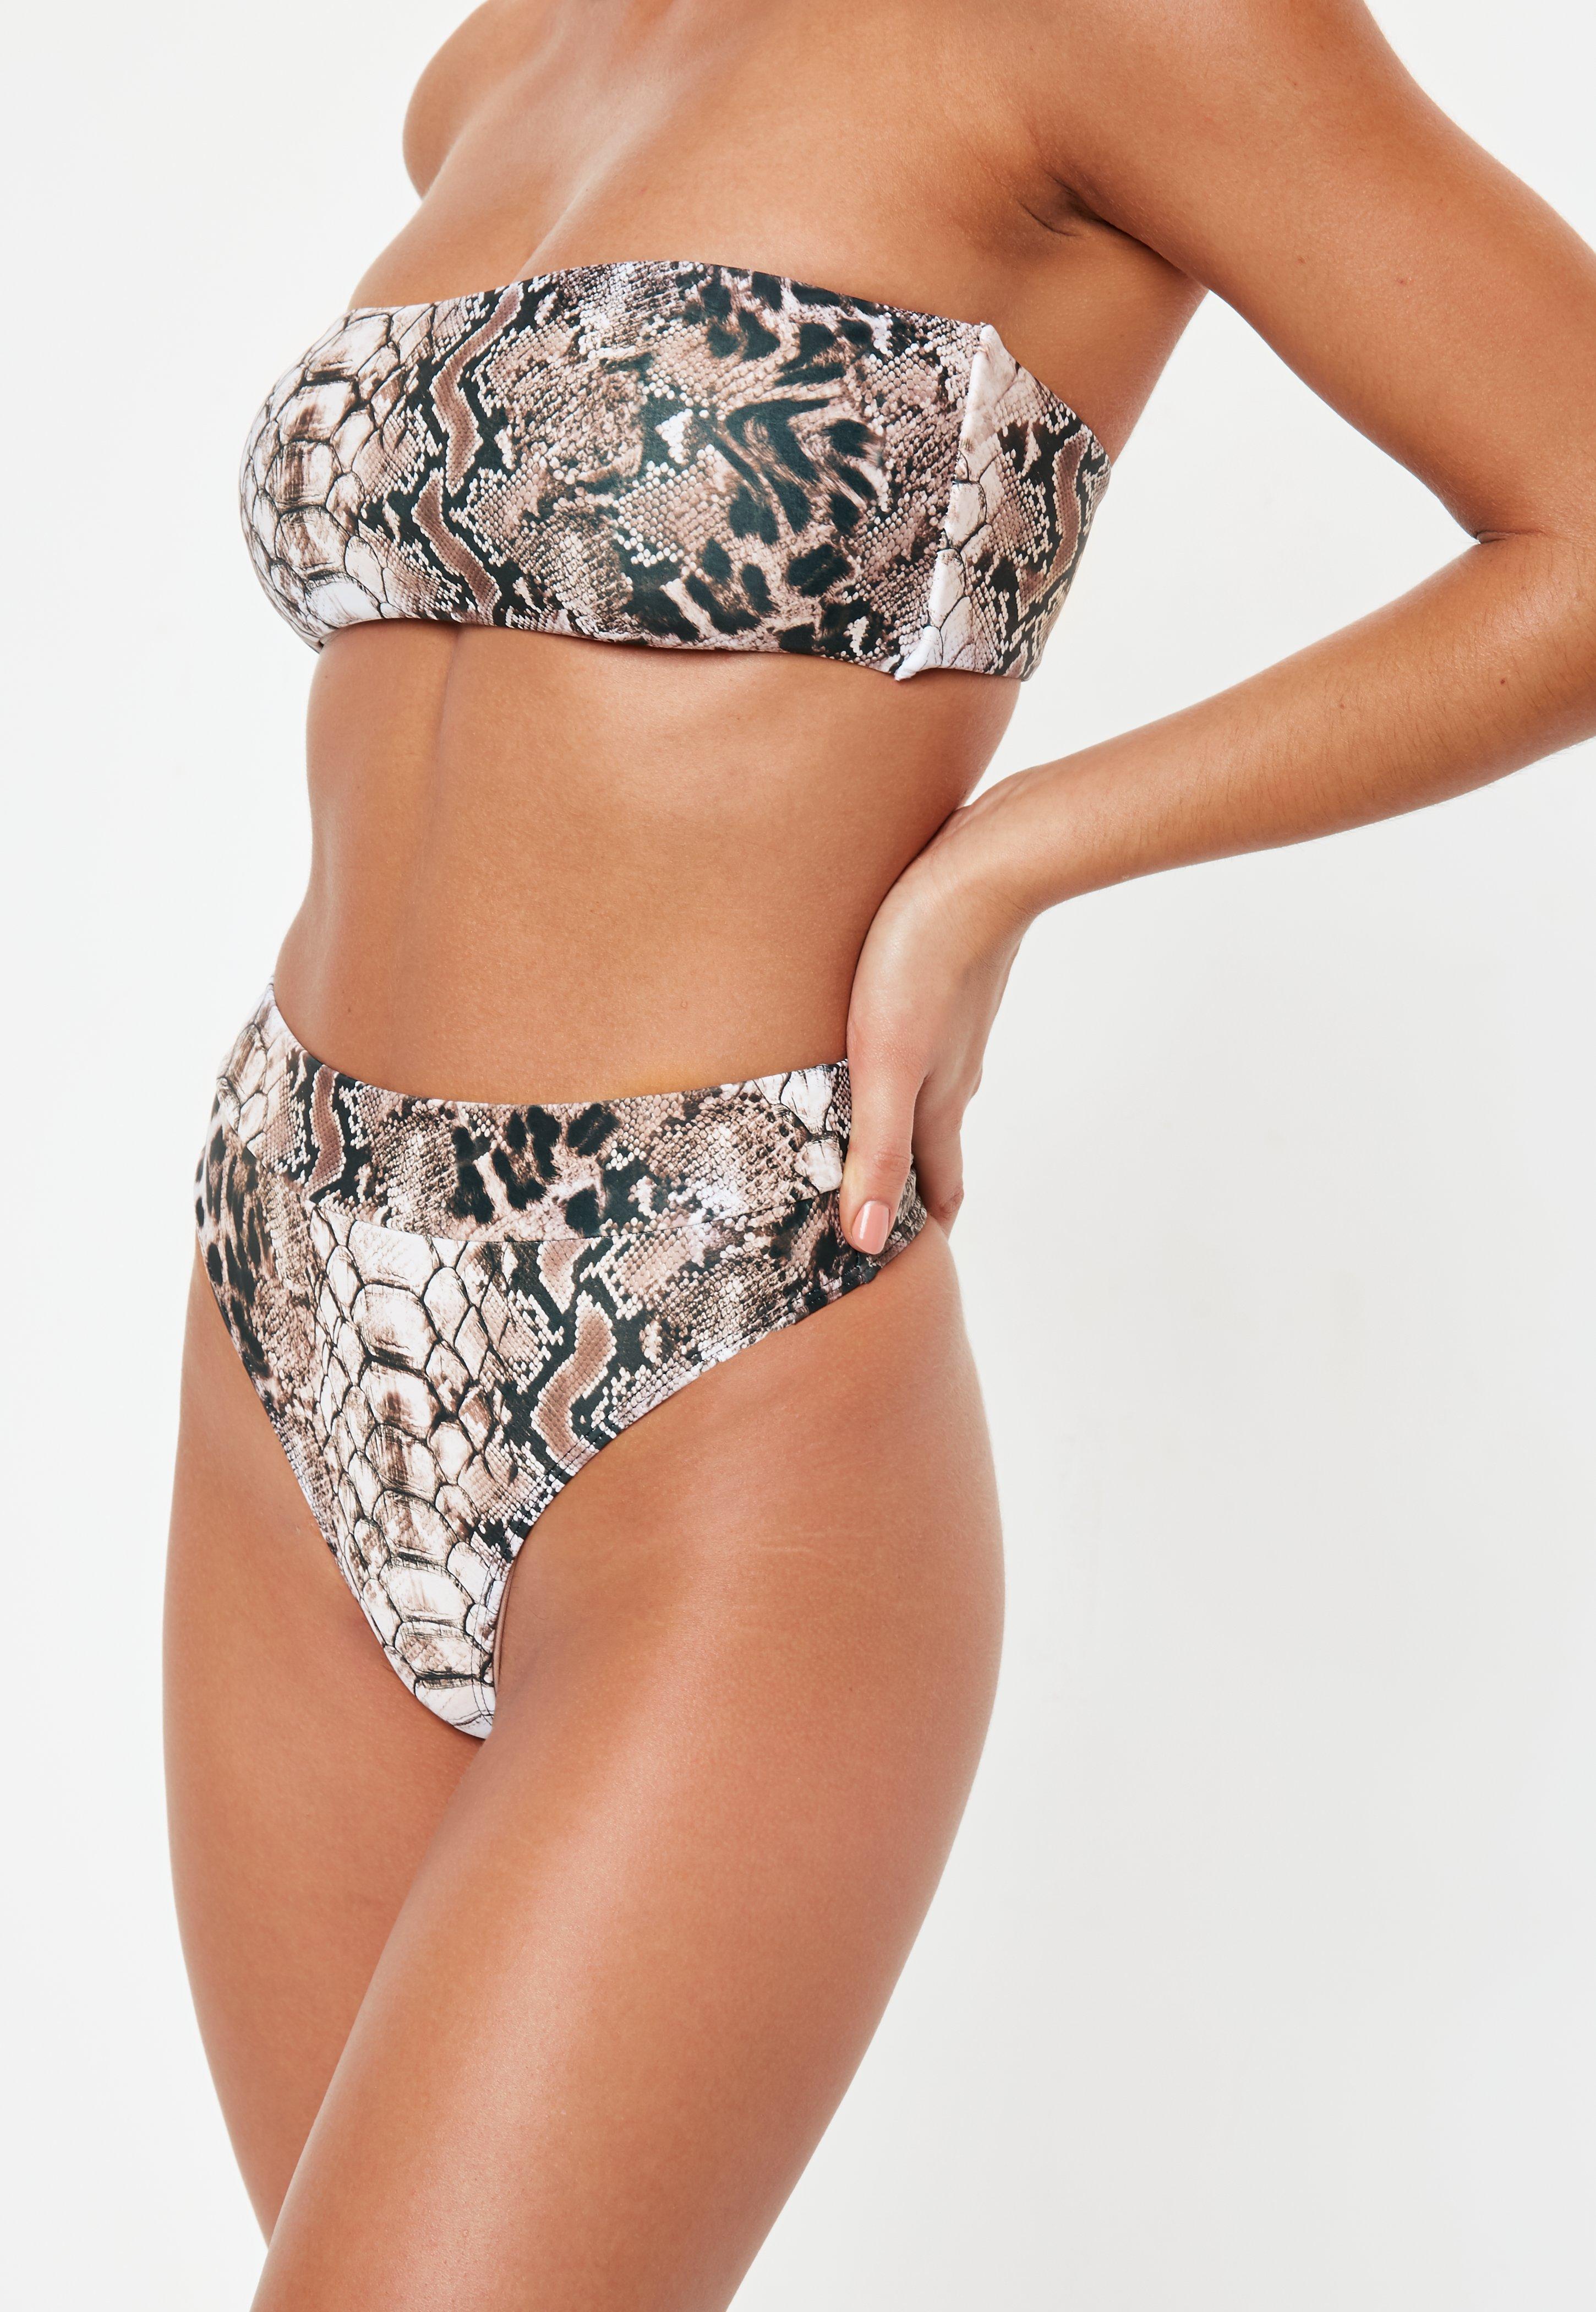 66e1f282e4 Brown Snakeskin Highwaisted Thong Bikini Bottoms - Mix And Match |  Missguided